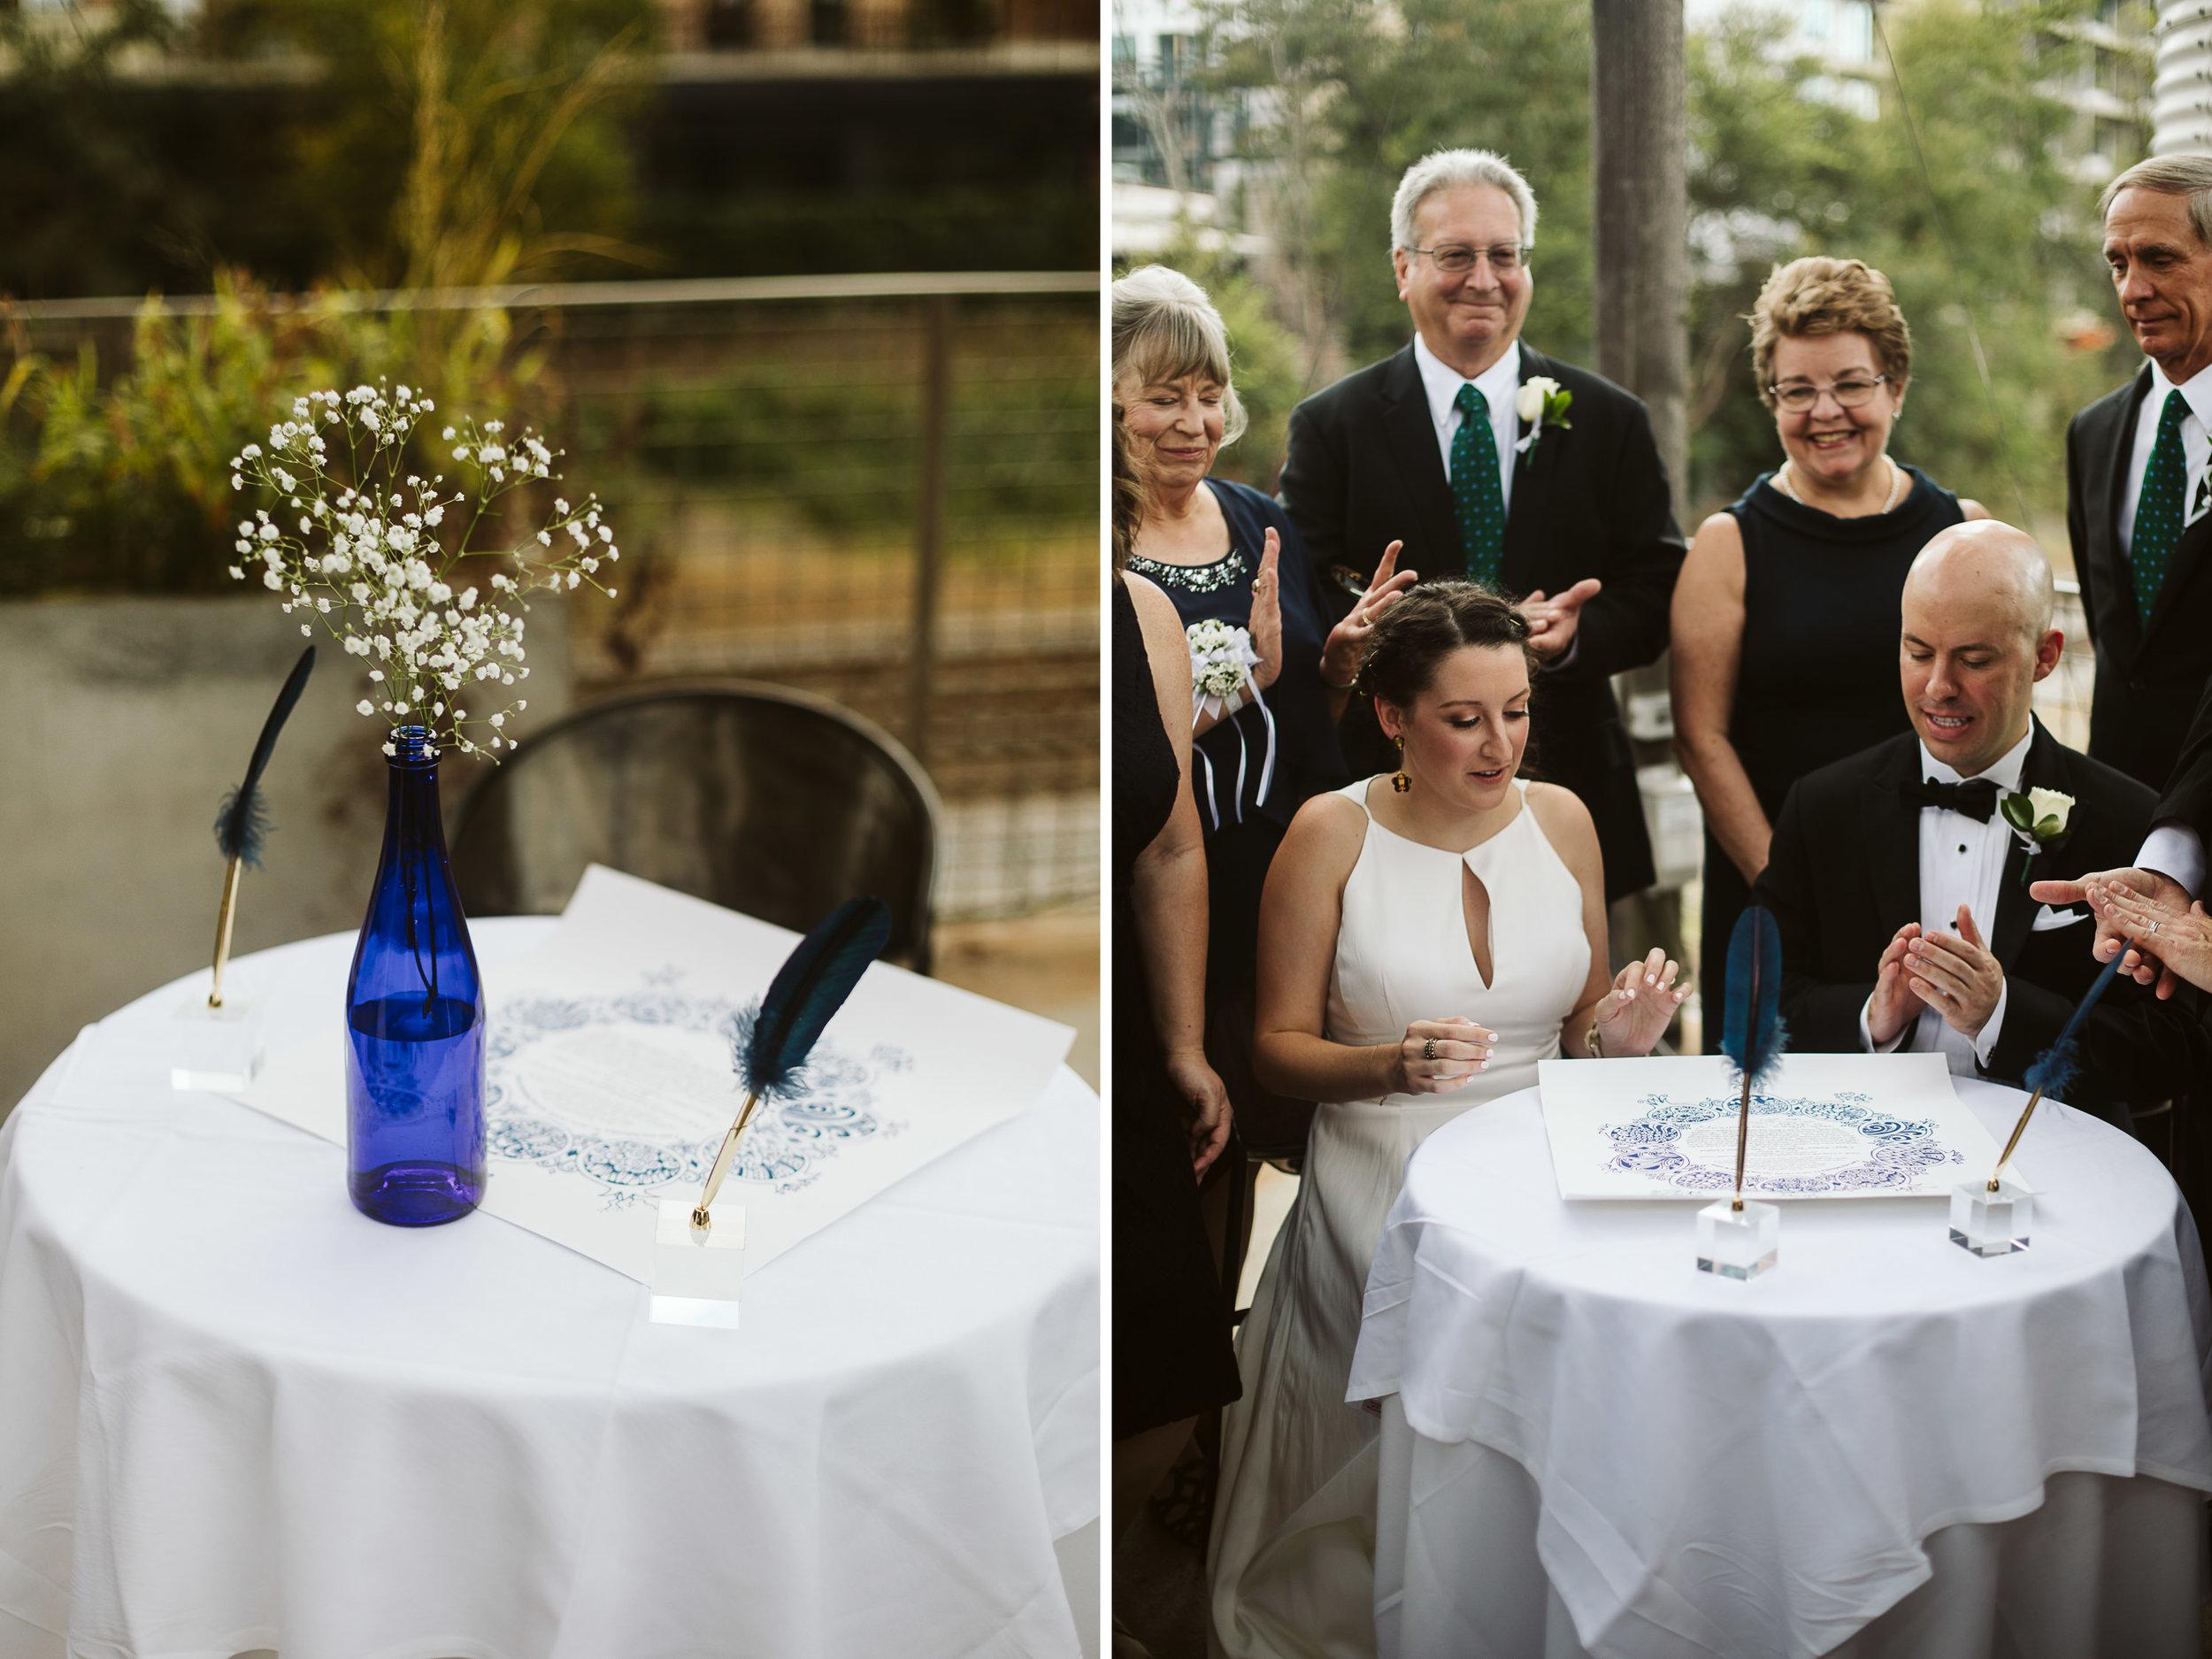 JCT-kitchen-and-bar-wedding-3.jpg